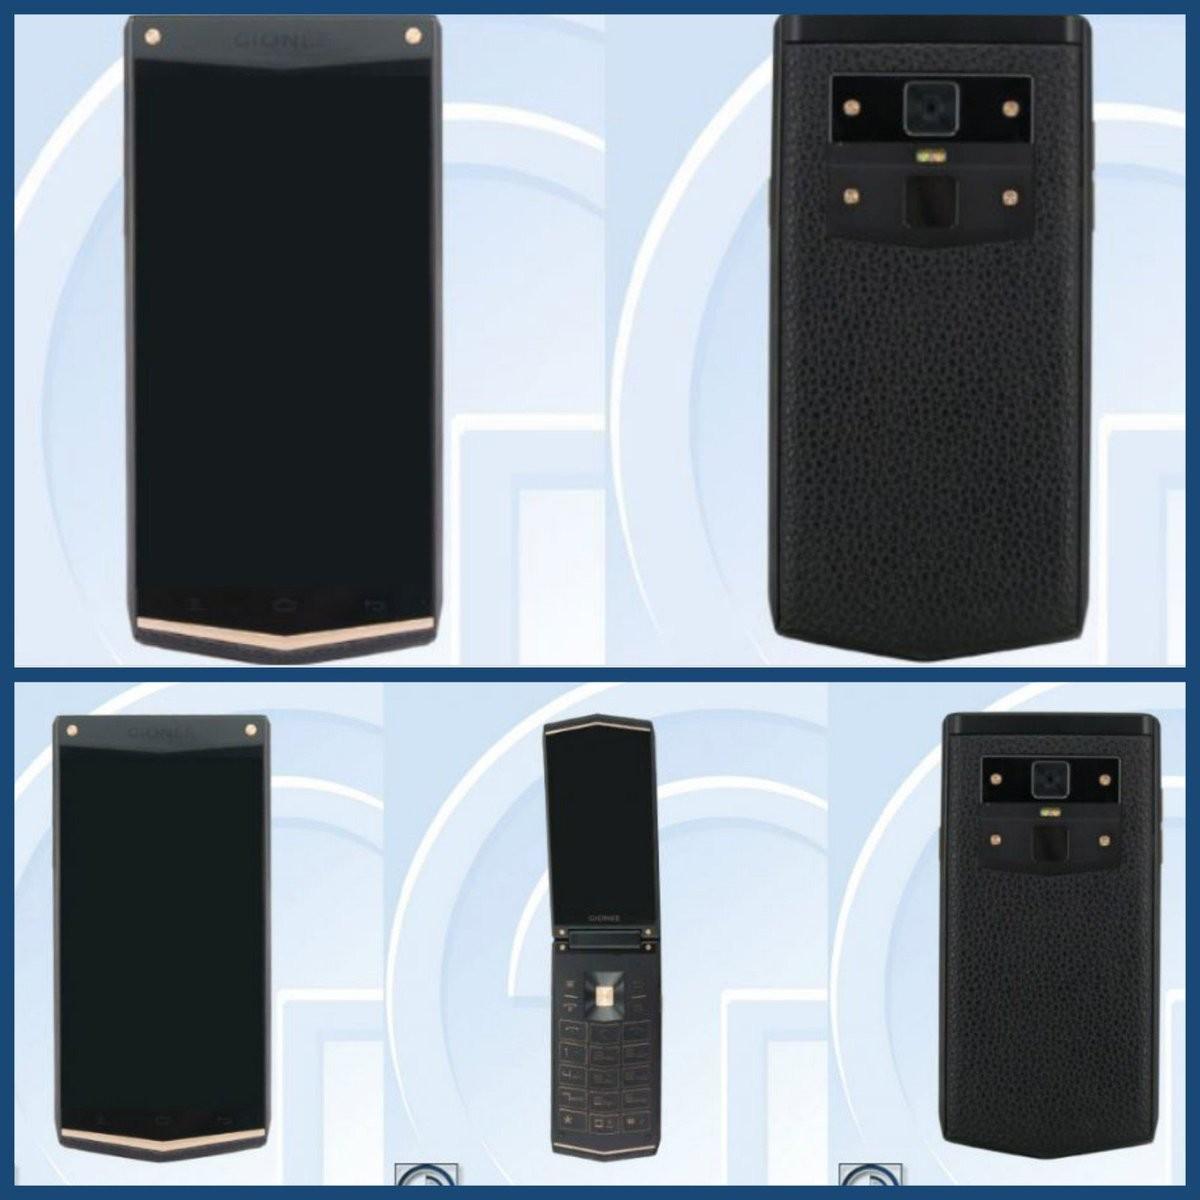 Появились сведения осмартфоне-раскладушке Gionee W919